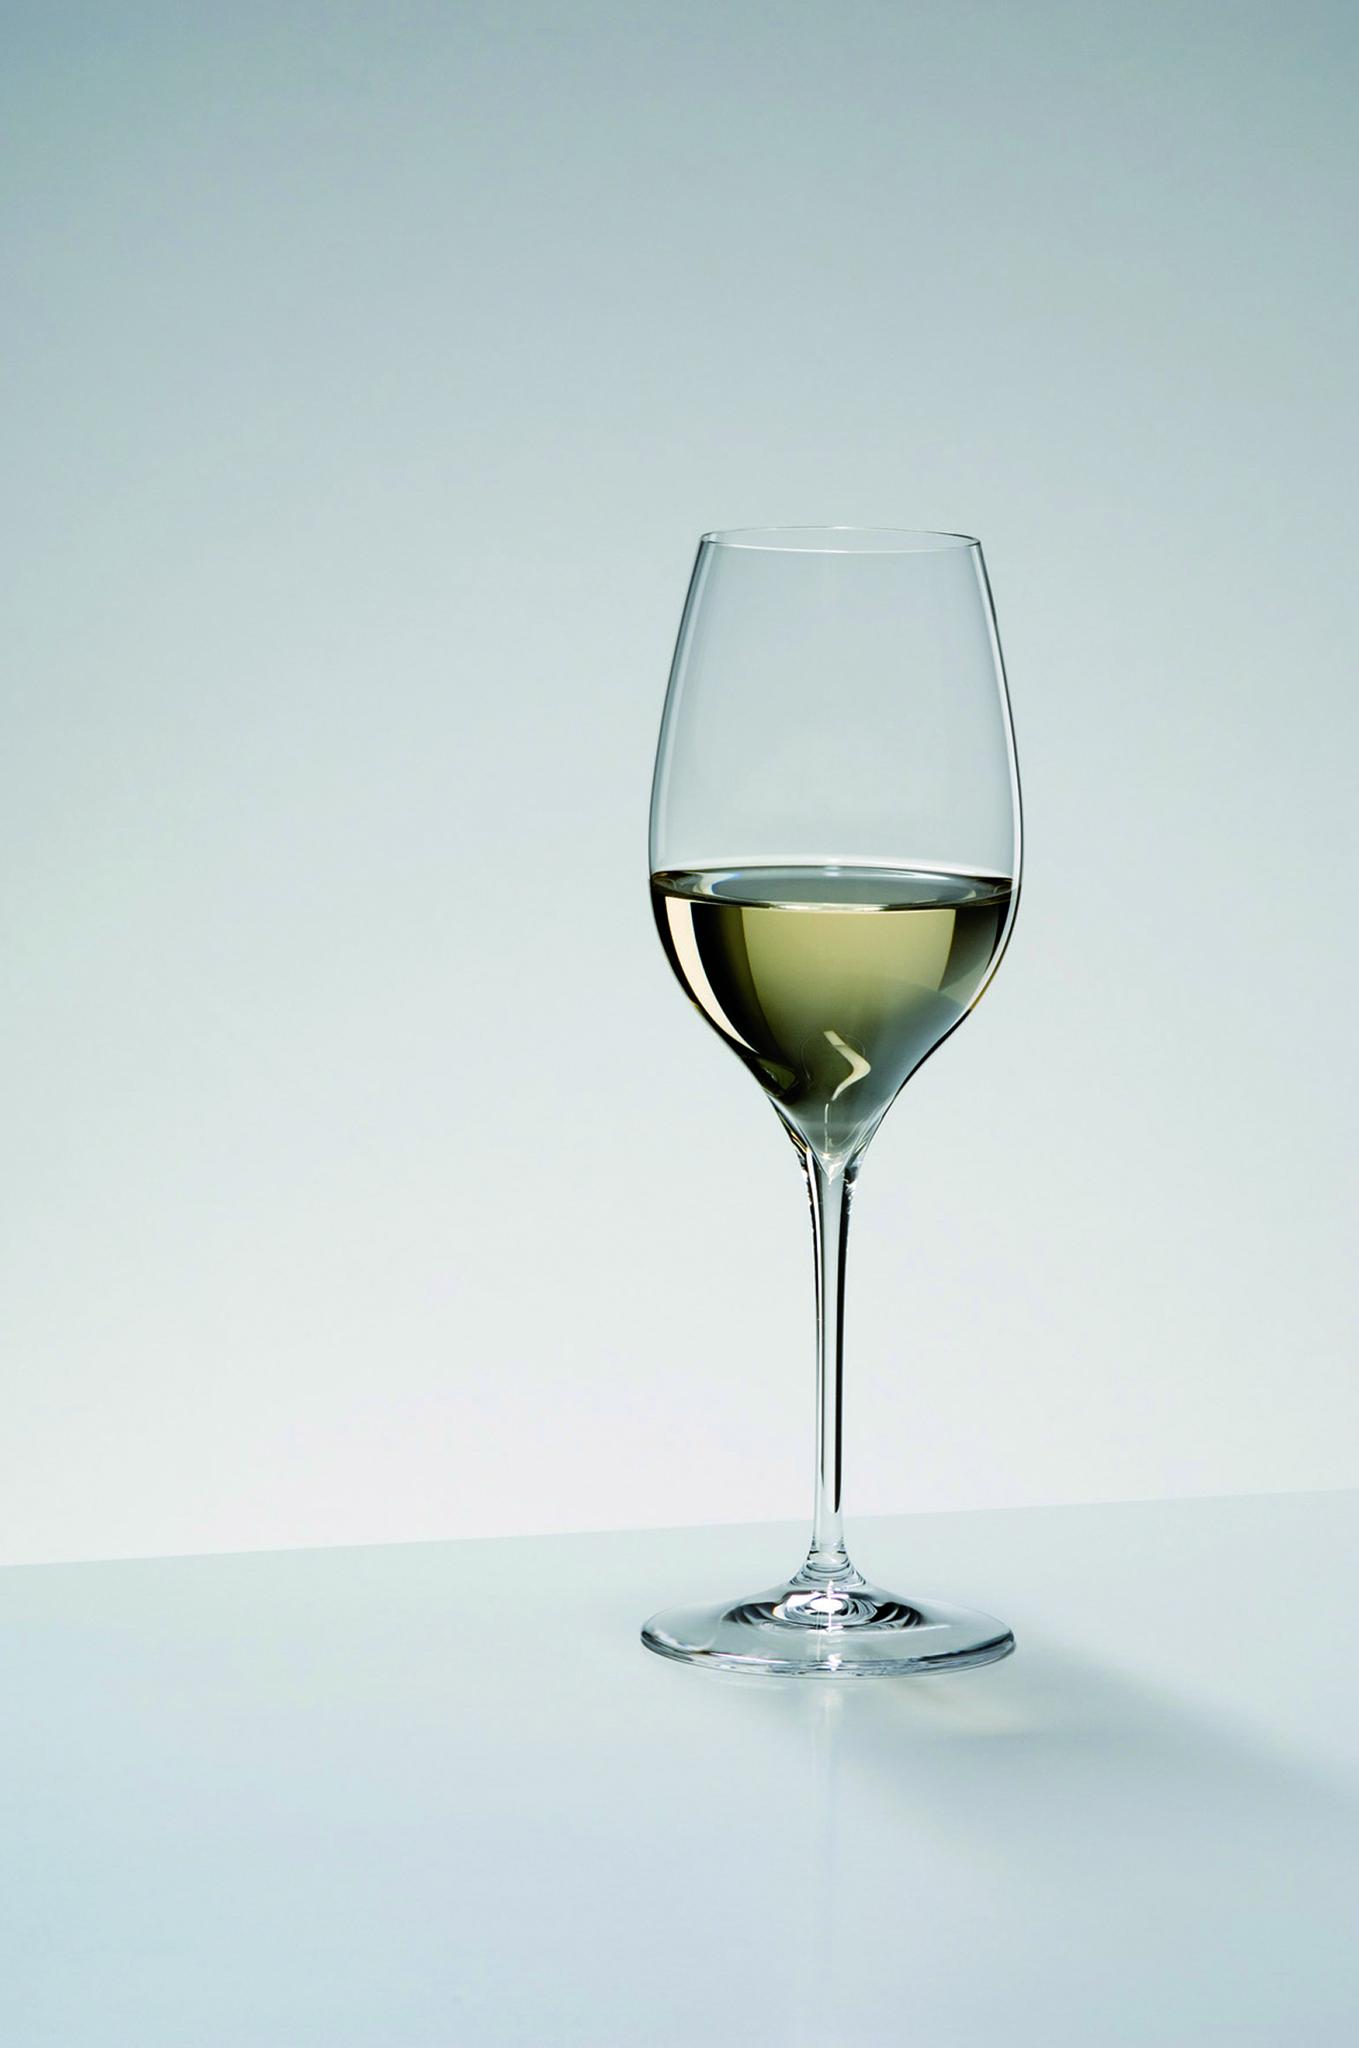 Бокалы Набор бокалов для белого вина 2 шт 350 мл Riedel Grape@Riedel Riesling/Sauvignon Blanc nabor-bokalov-dlya-belogo-vina-2-sht-350-ml-riedel-graperiedel-riesling-sauvignon-blanc-avstriya.jpg